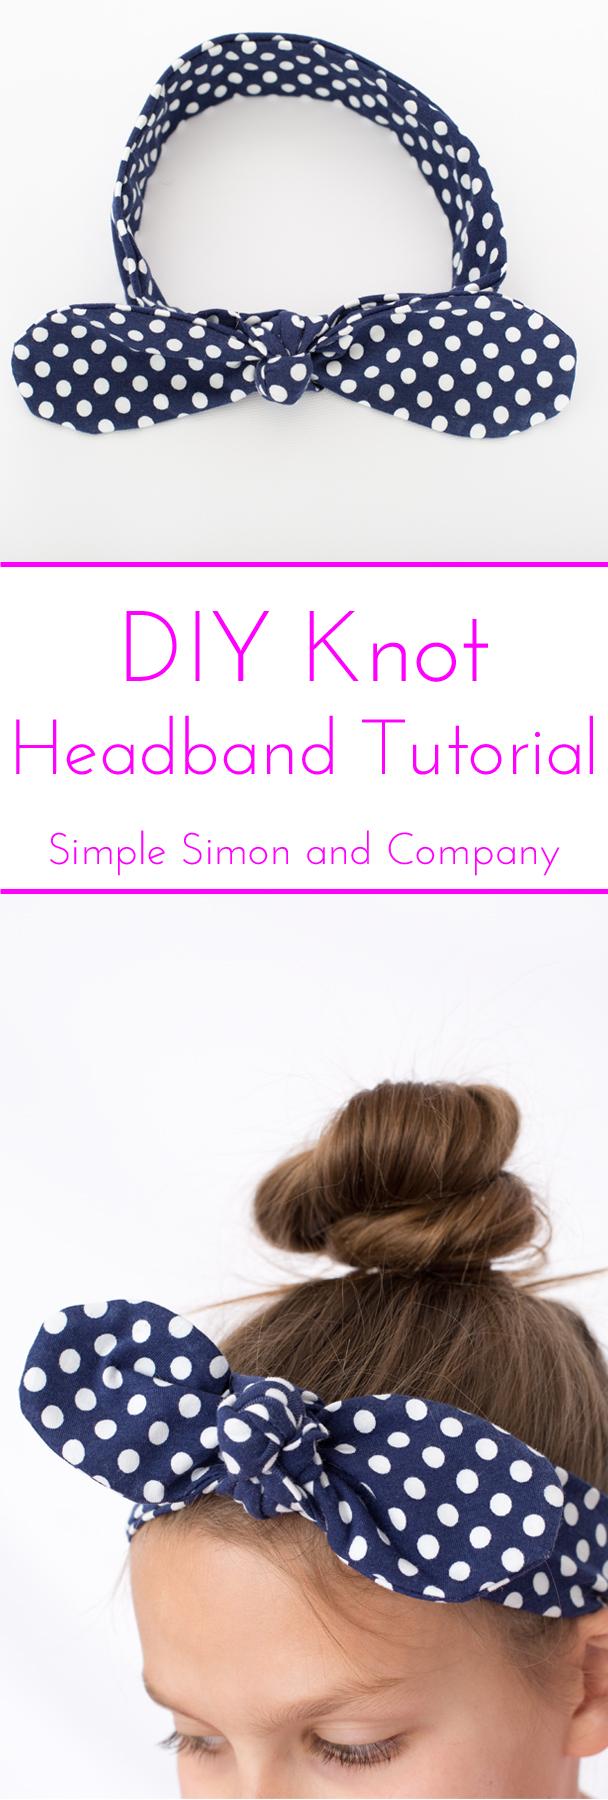 DIY knot Headband Tutorial Simple Simon